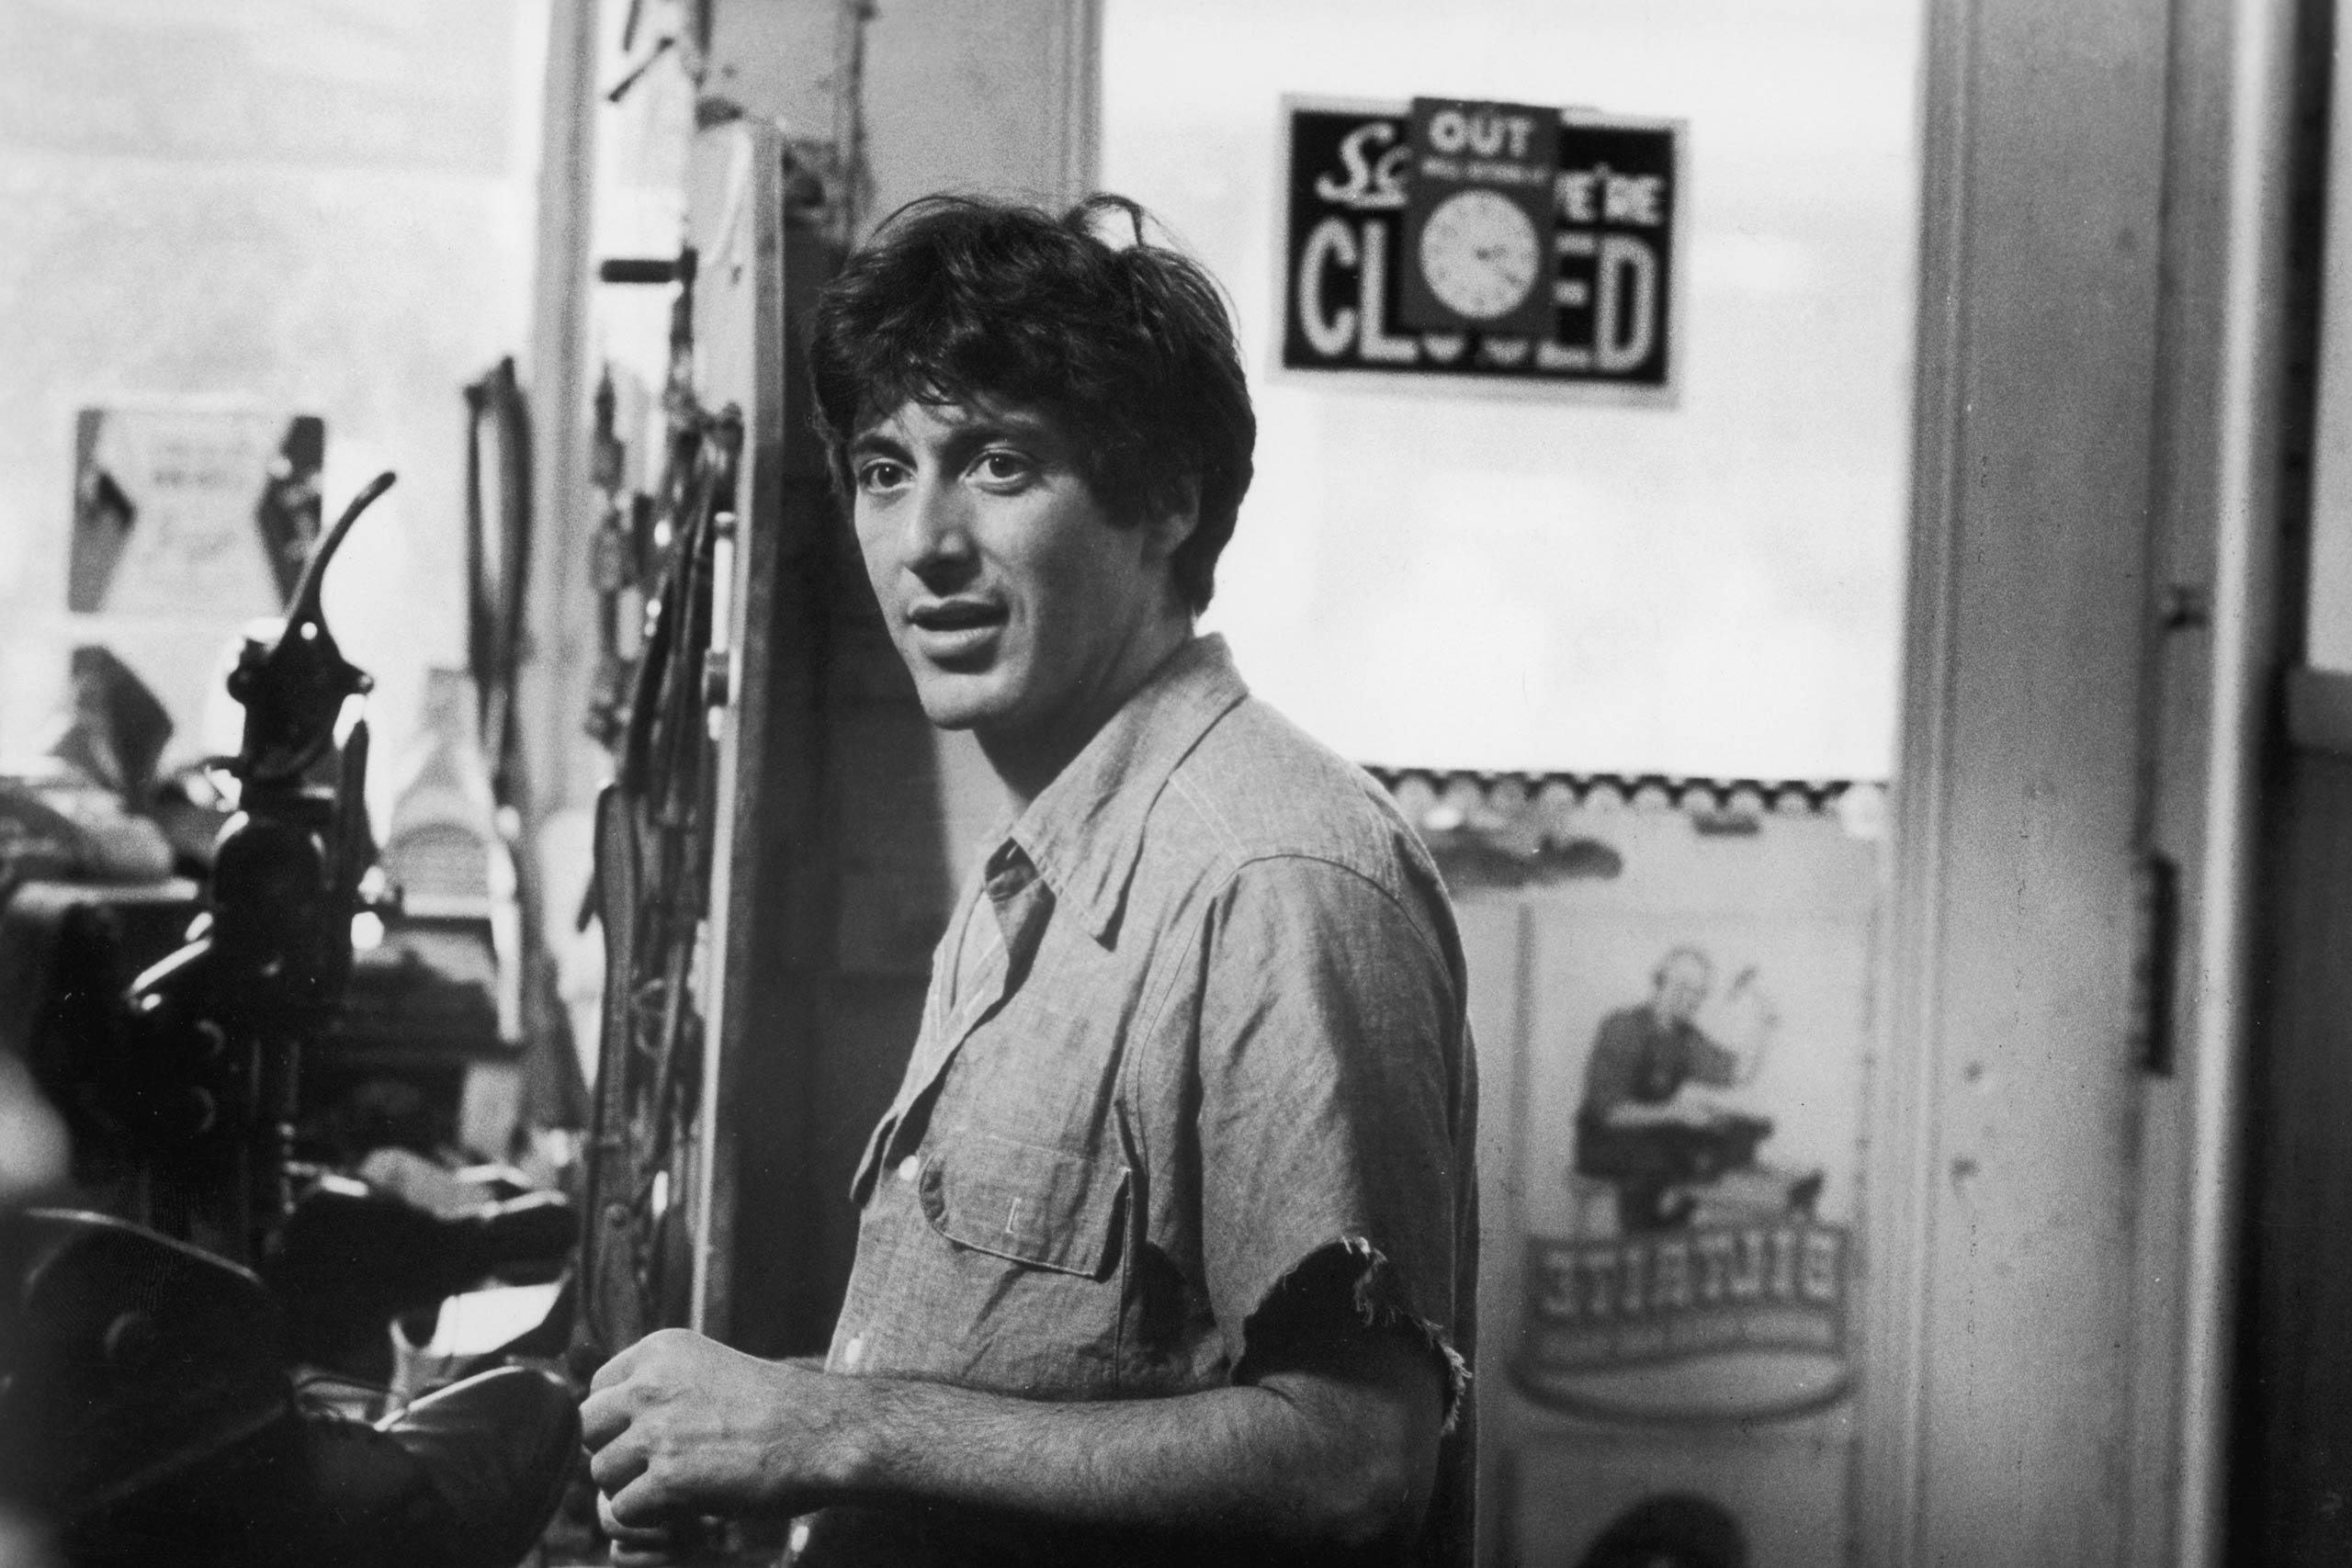 Frank Serpico - Serpico, 1973